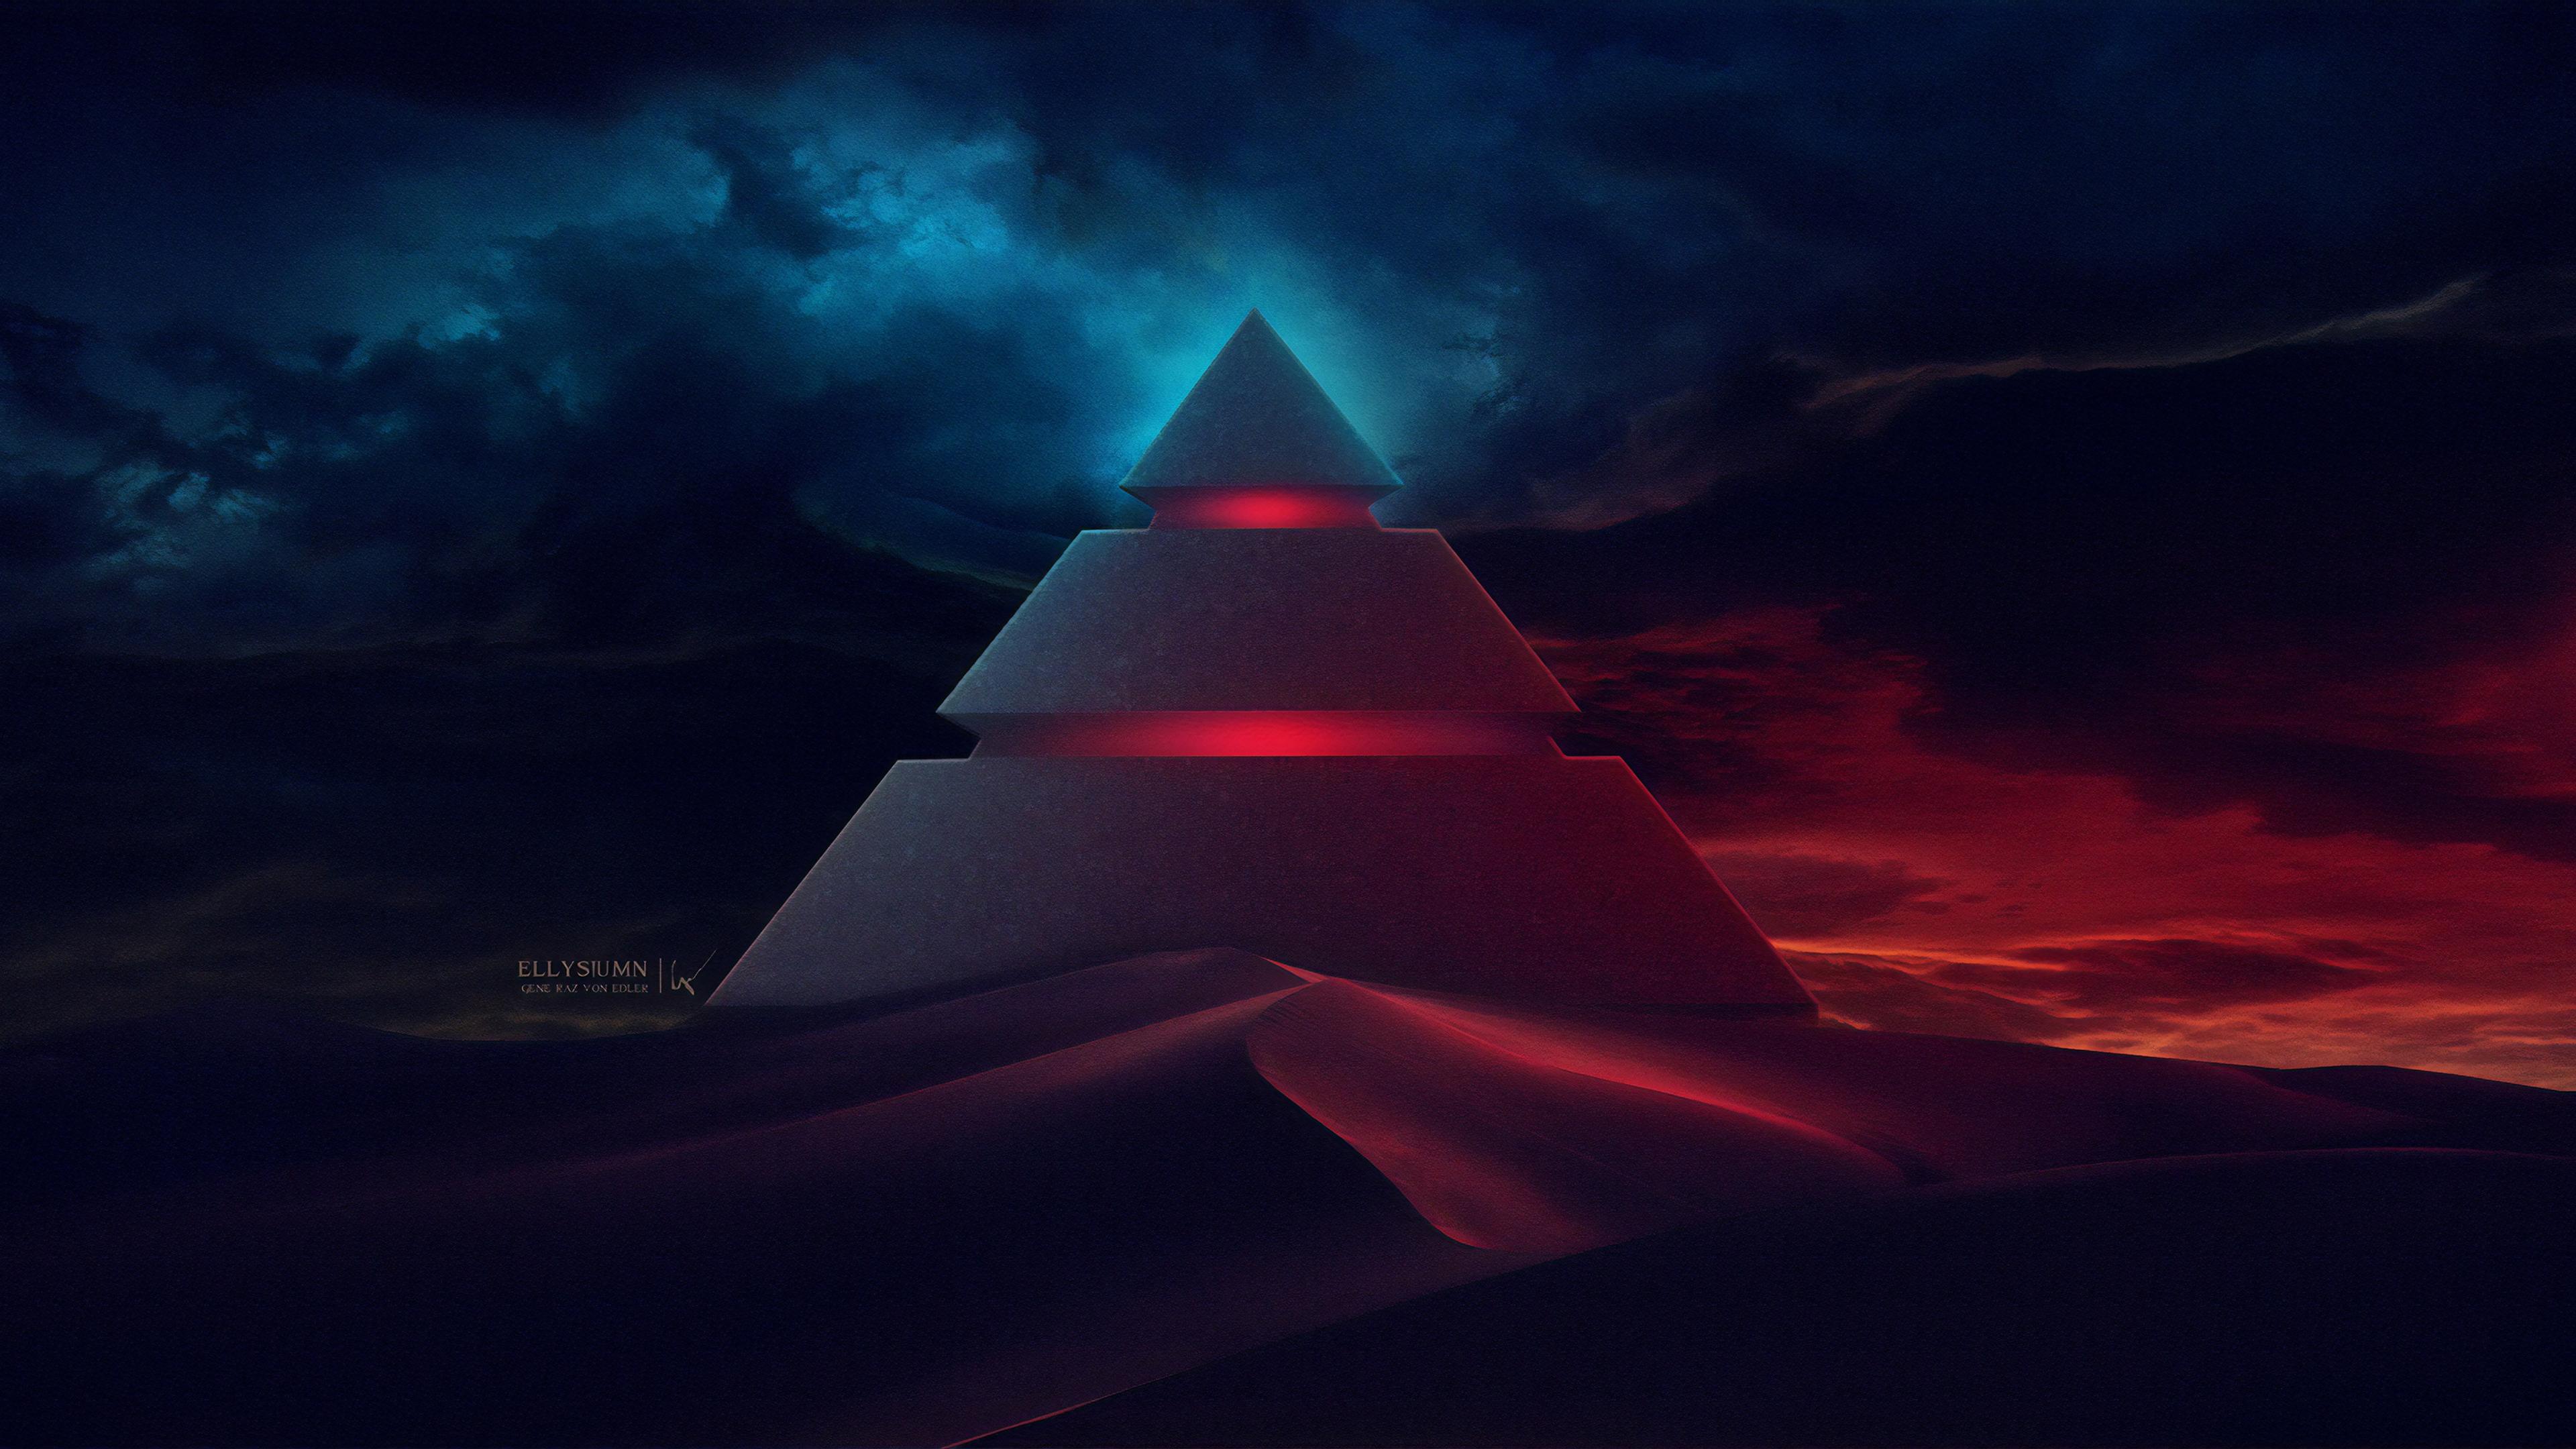 pyramid digital art 1563222066 - Pyramid Digital Art - pyramid wallpapers, hd-wallpapers, digital art wallpapers, artwork wallpapers, artstation wallpapers, artist wallpapers, 4k-wallpapers